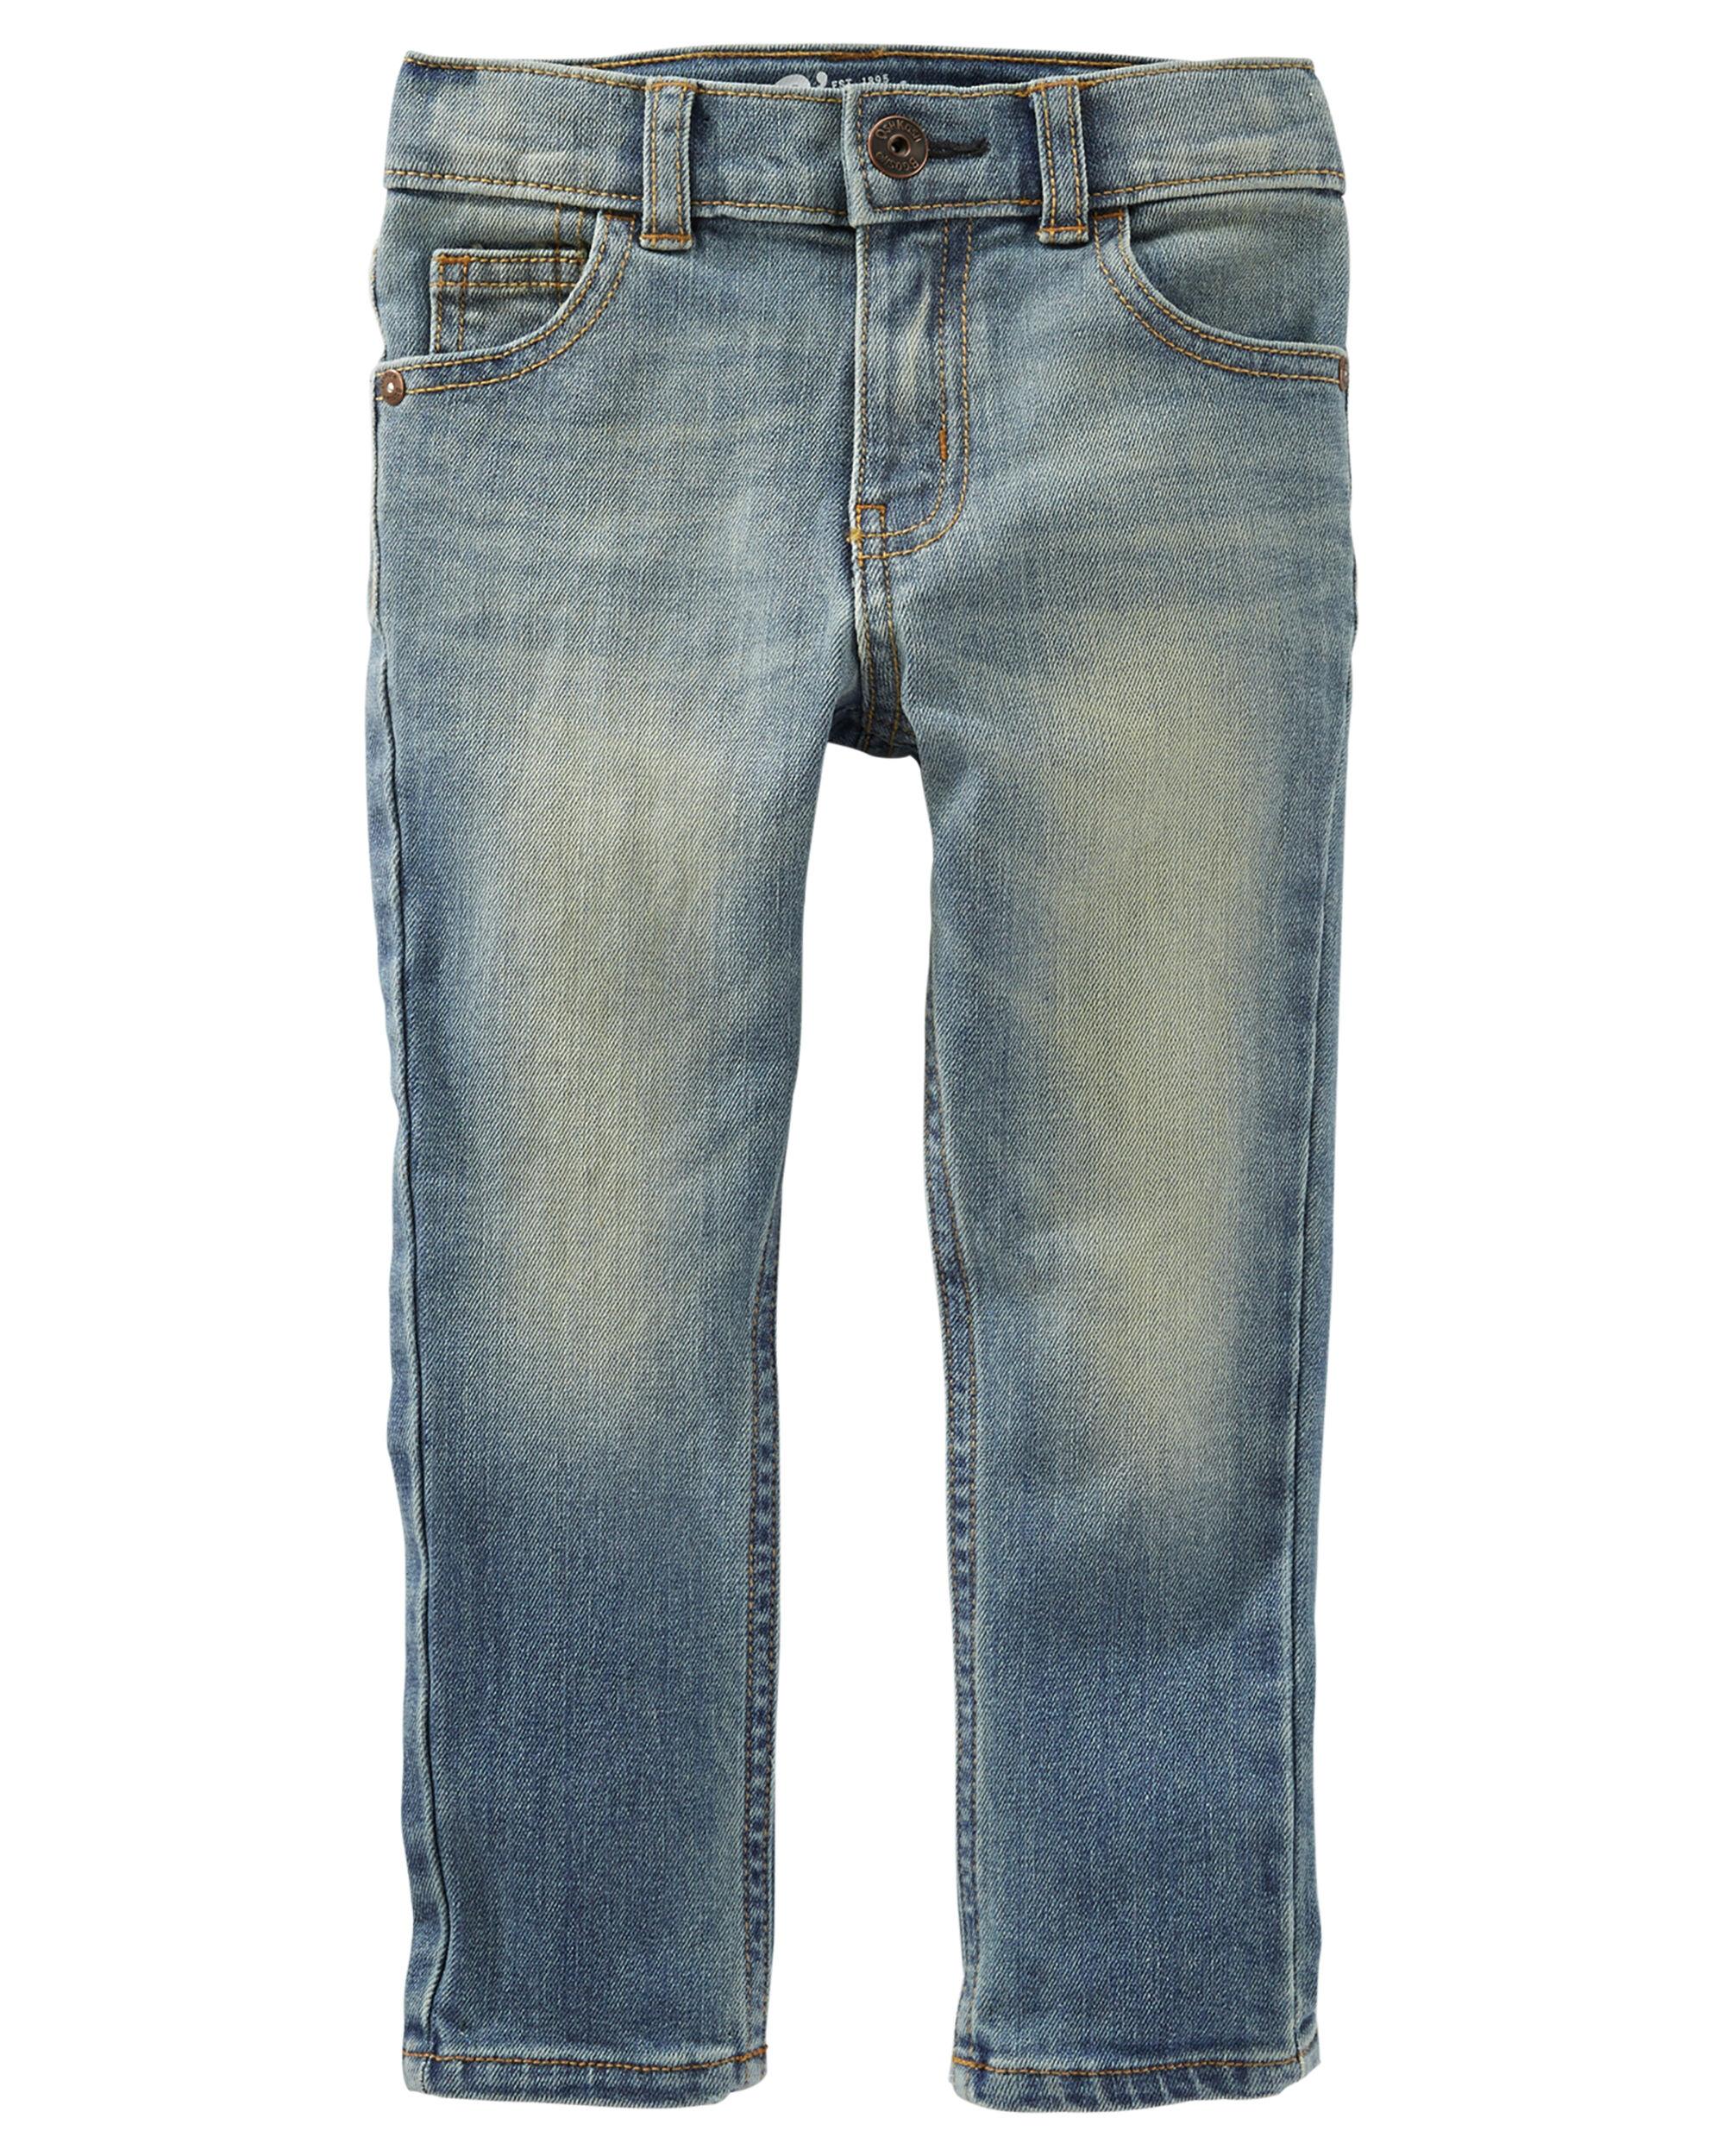 925cb61122be Skinny Jeans - Tumbled Light - Regular